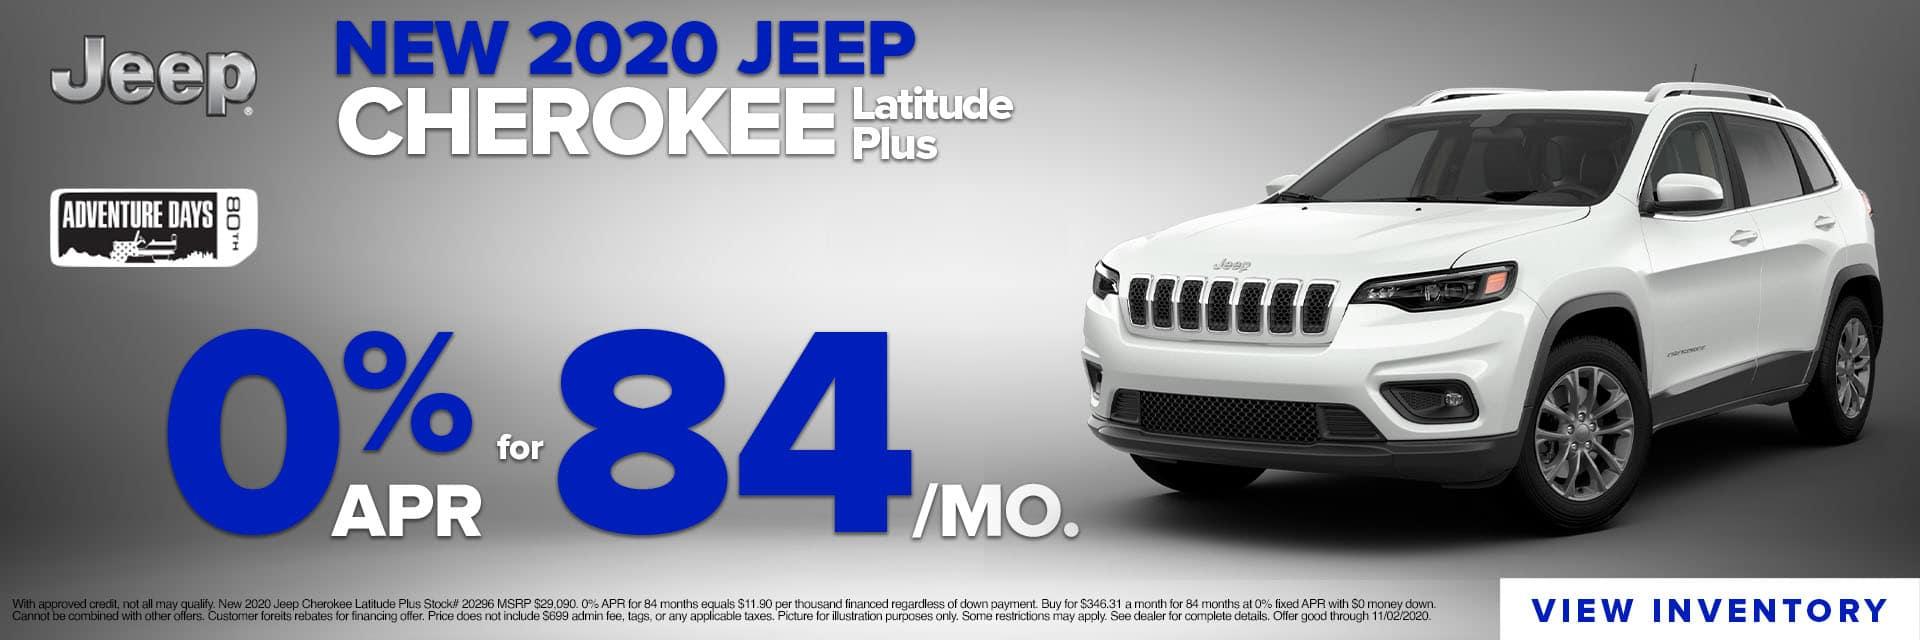 CLGO-October 2020-2020 Jeep Cherokee Inspire Slider